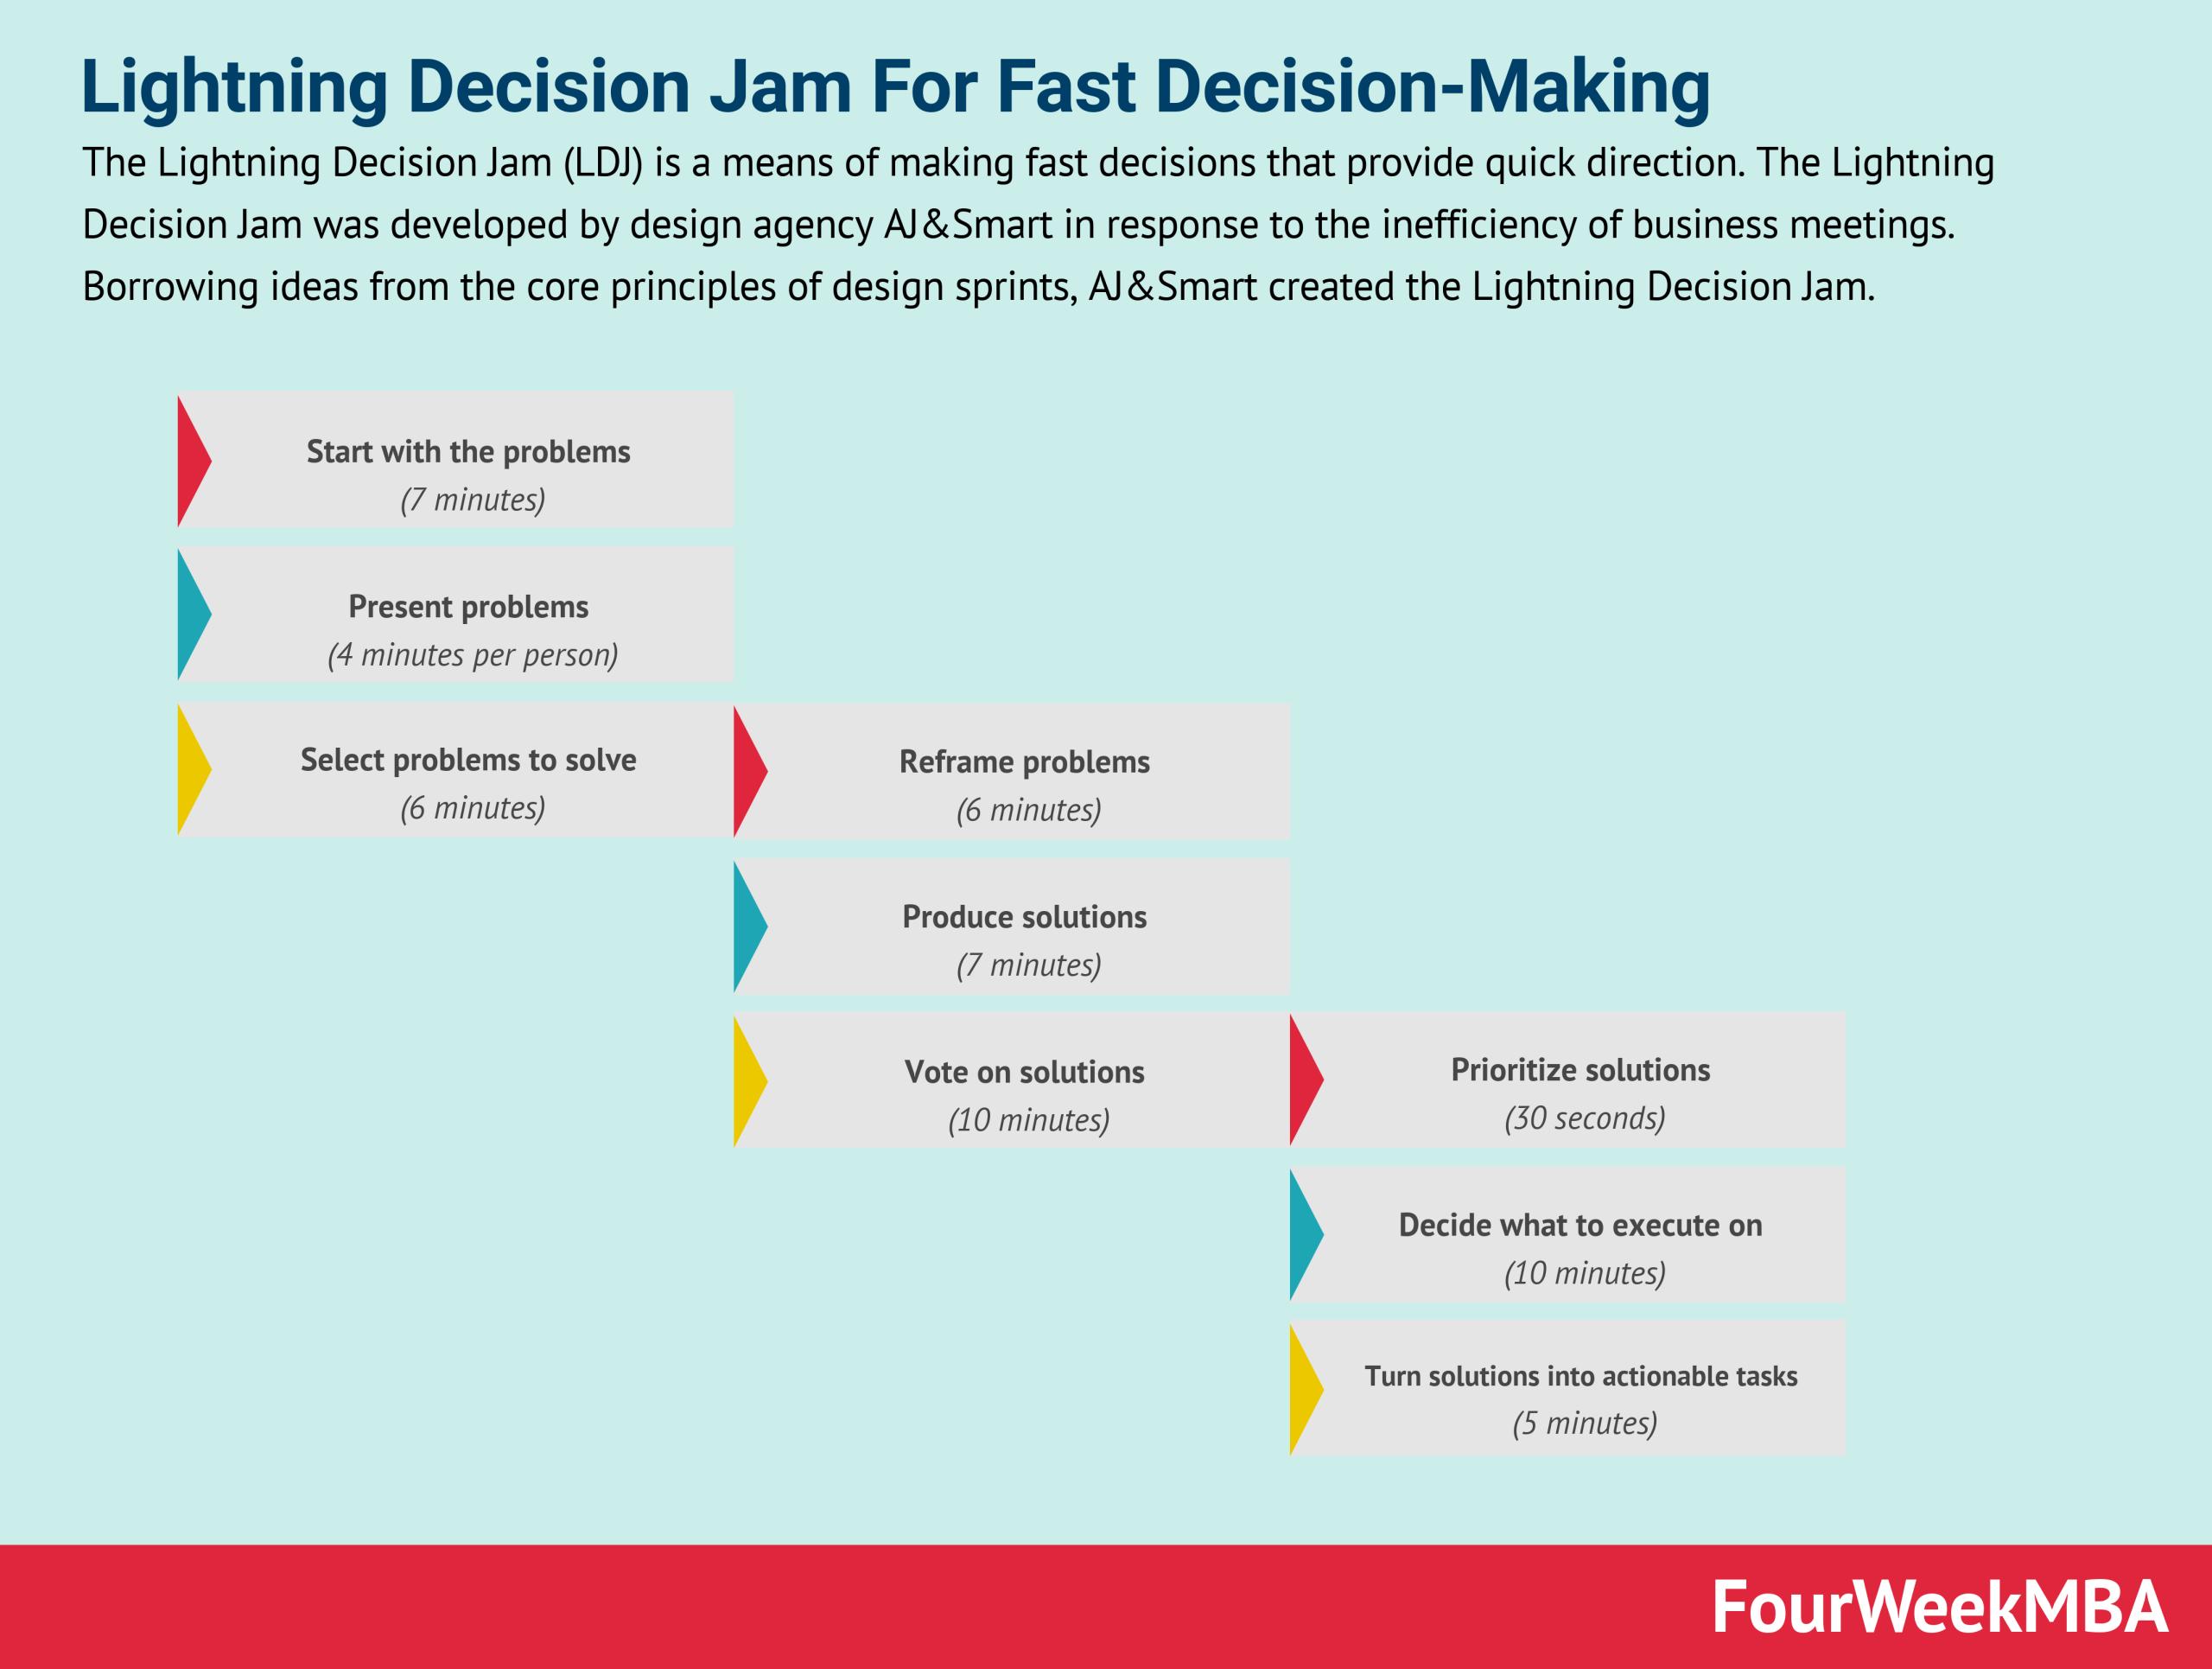 The Lightning Decision Jam